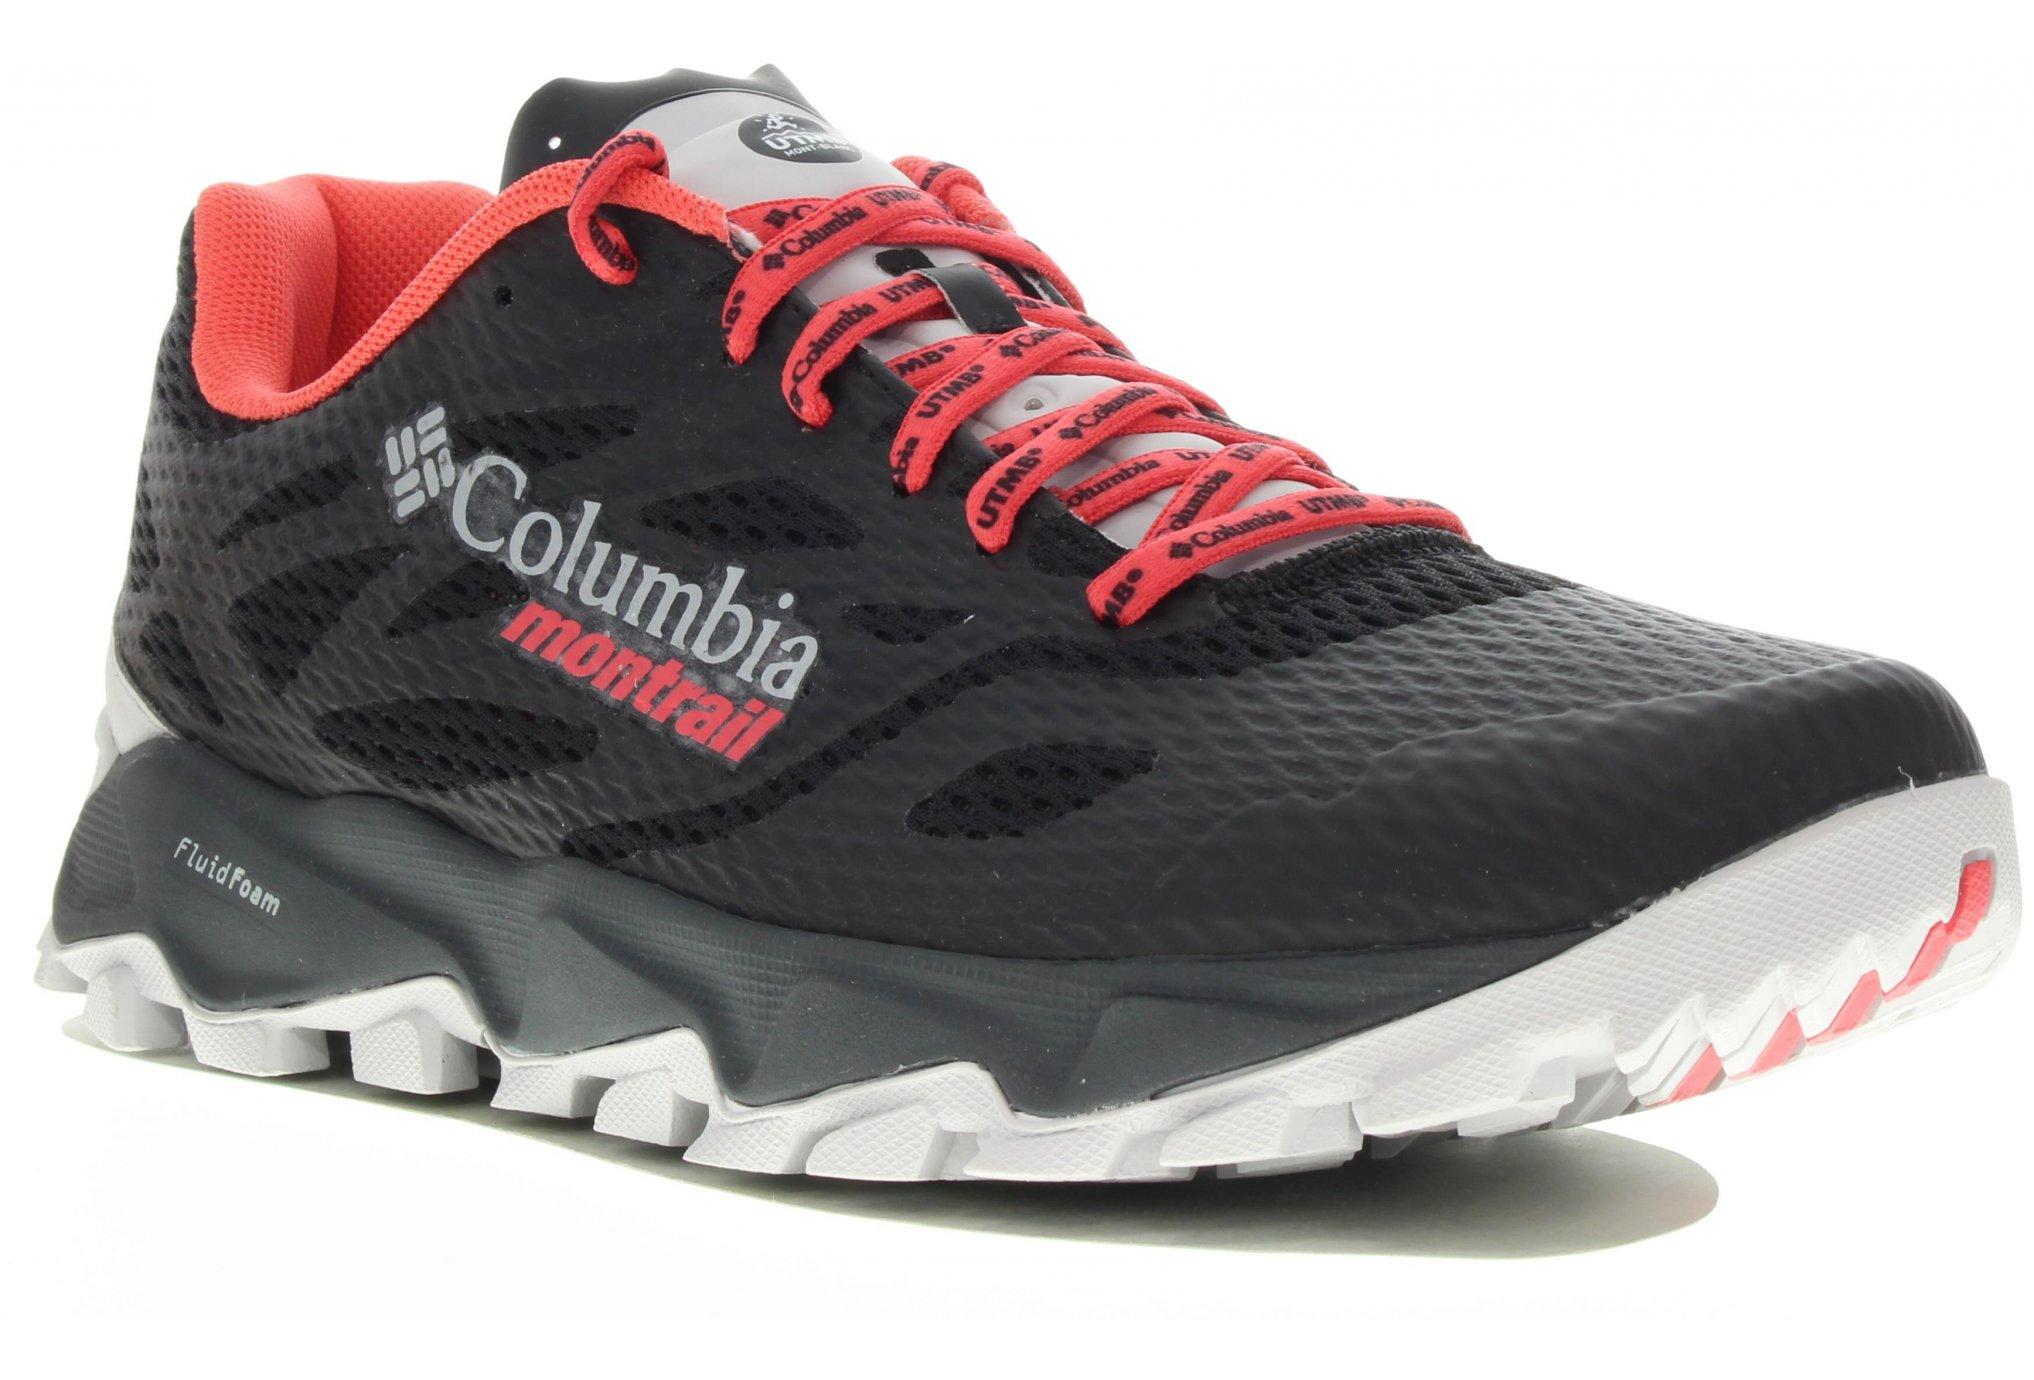 Columbia Montrail Trans Alps II F.K.T. UTMB W Chaussures running femme